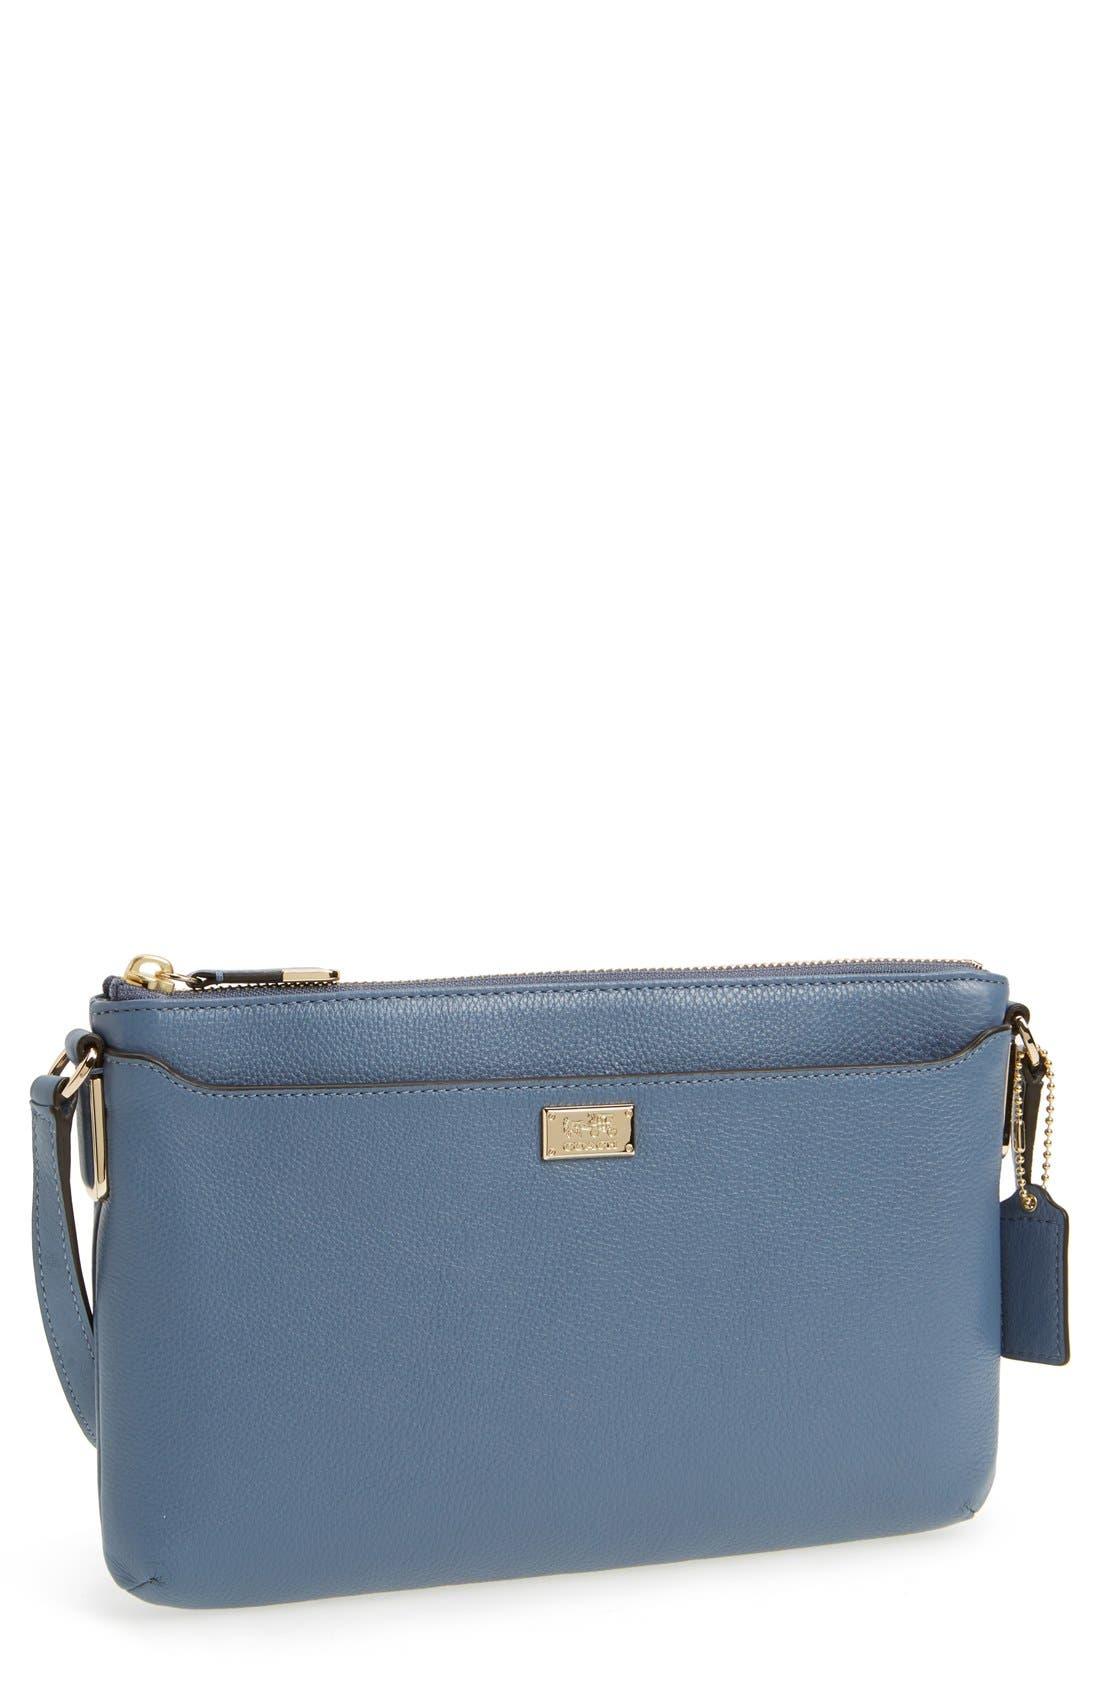 Main Image - COACH 'Madison - New Swingpack' Leather Crossbody Bag